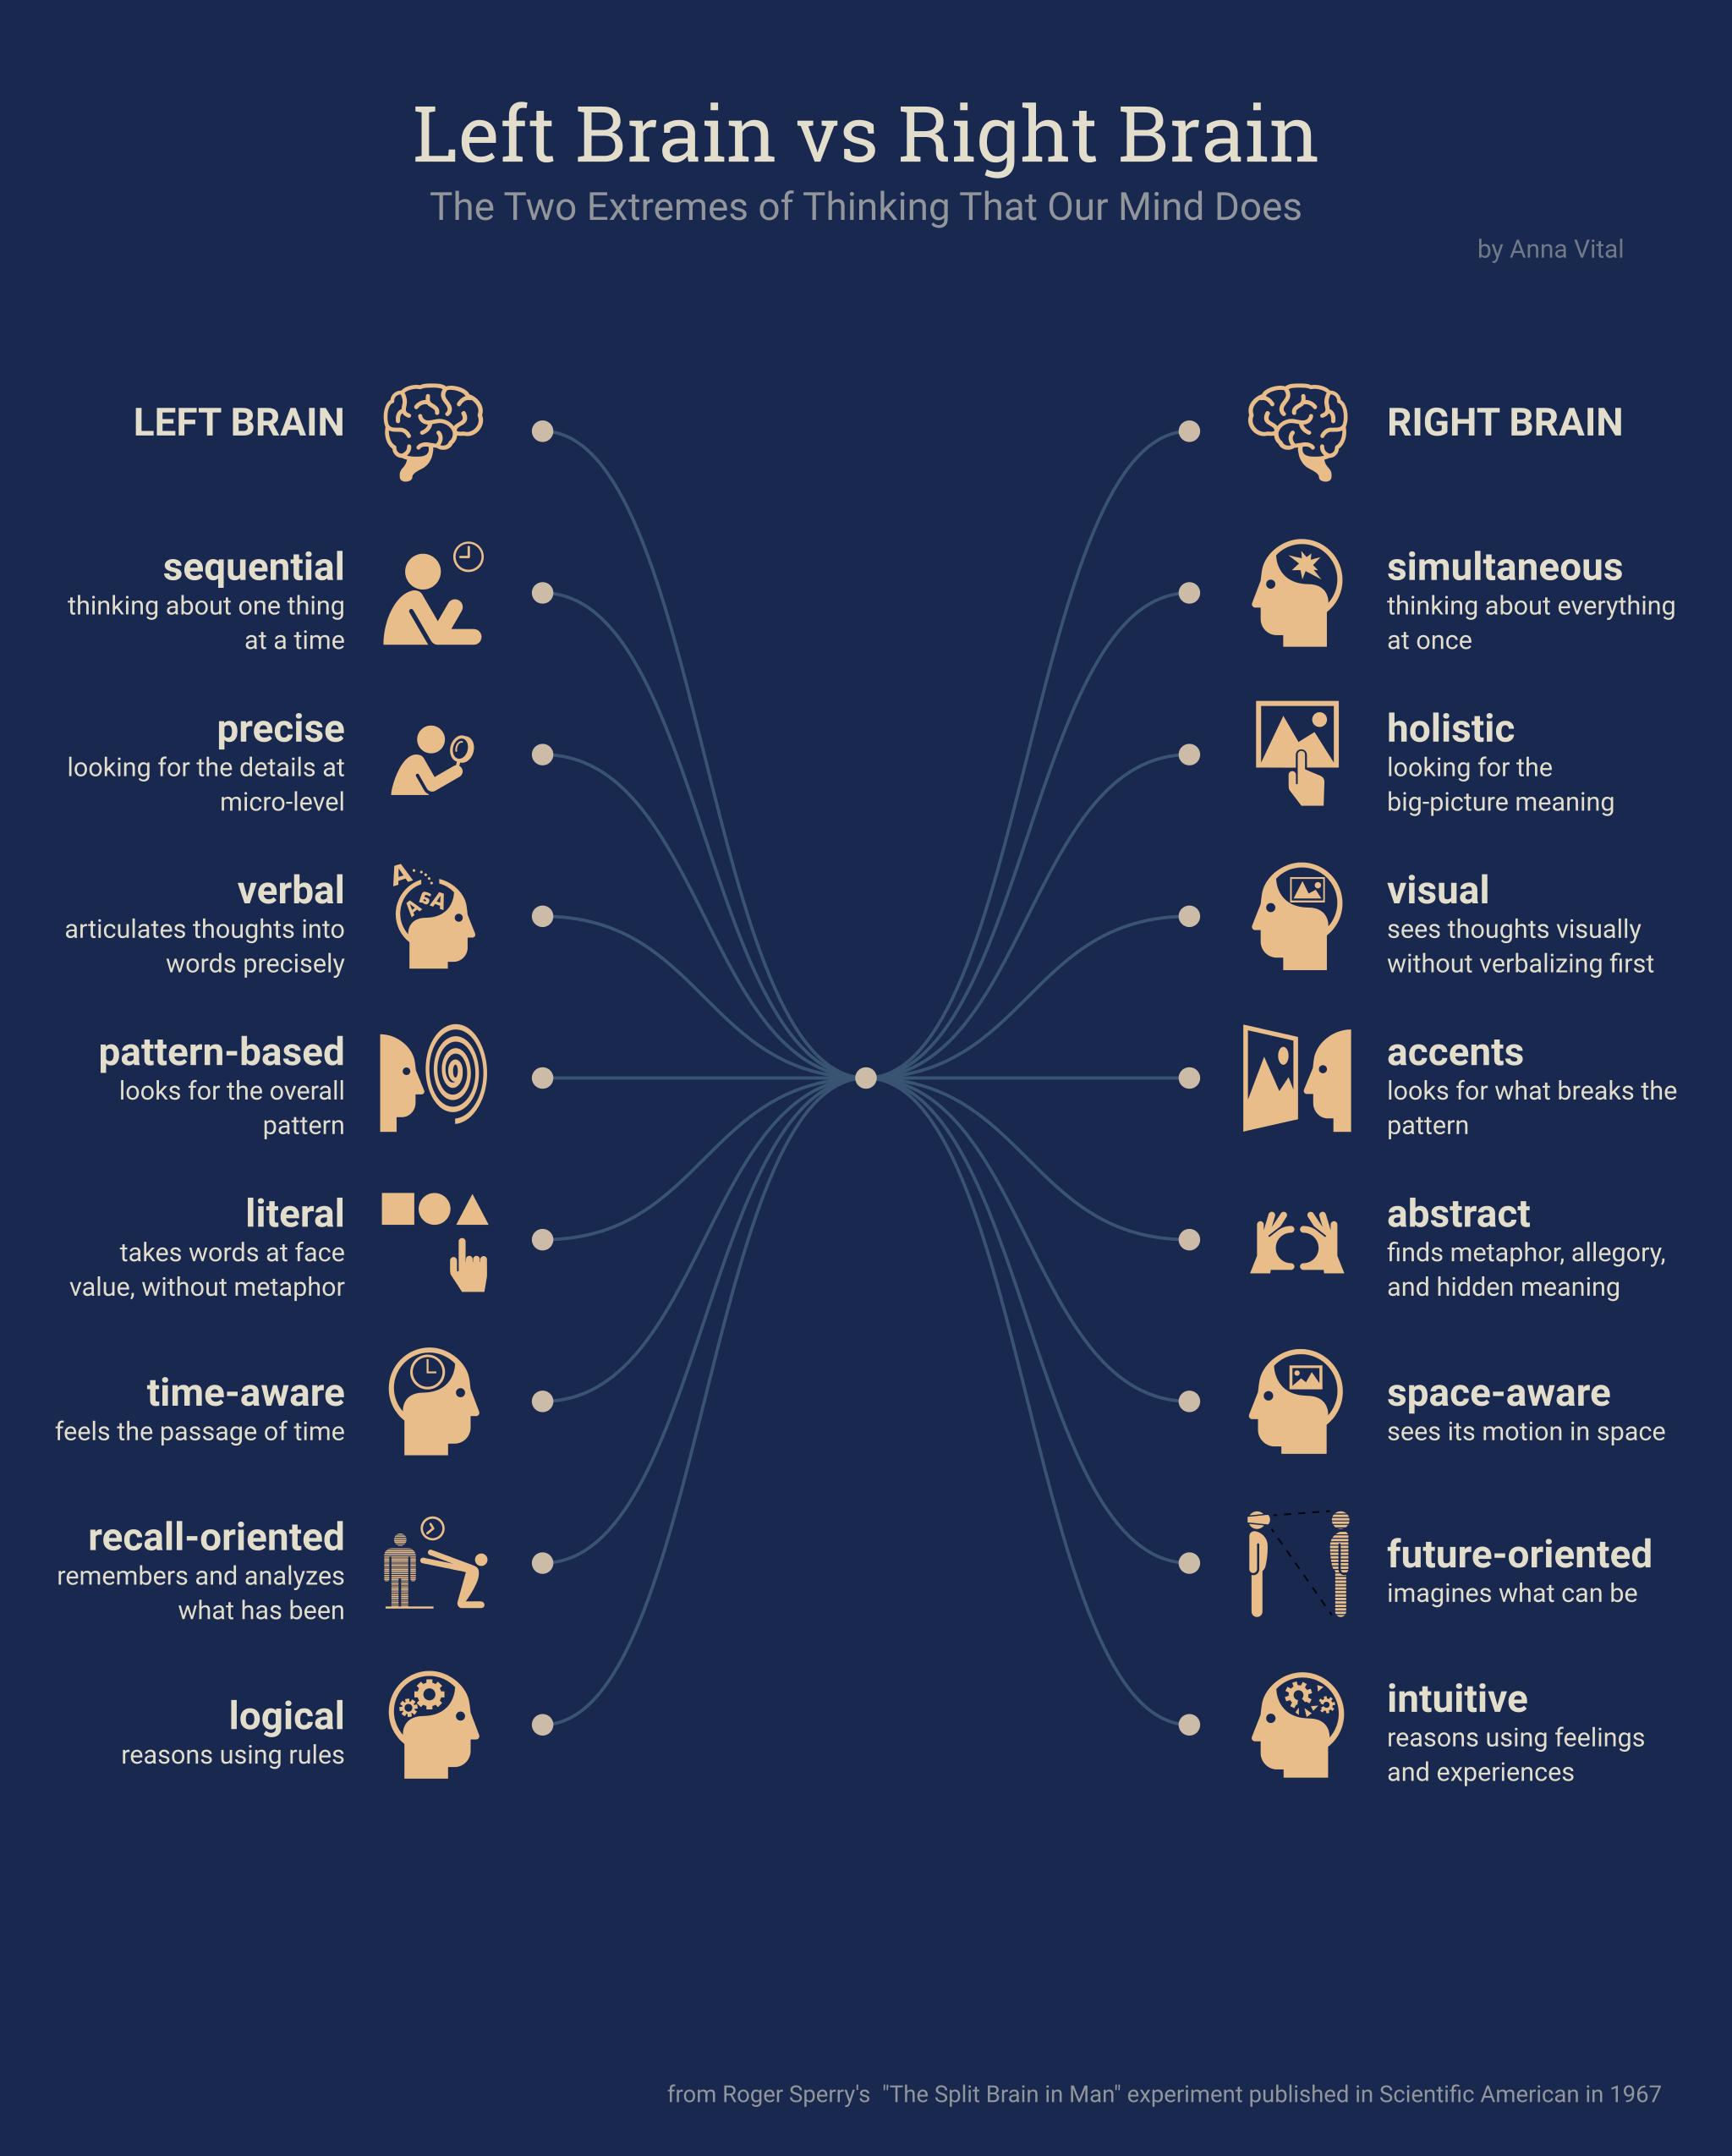 Left Brain vs Right Brain